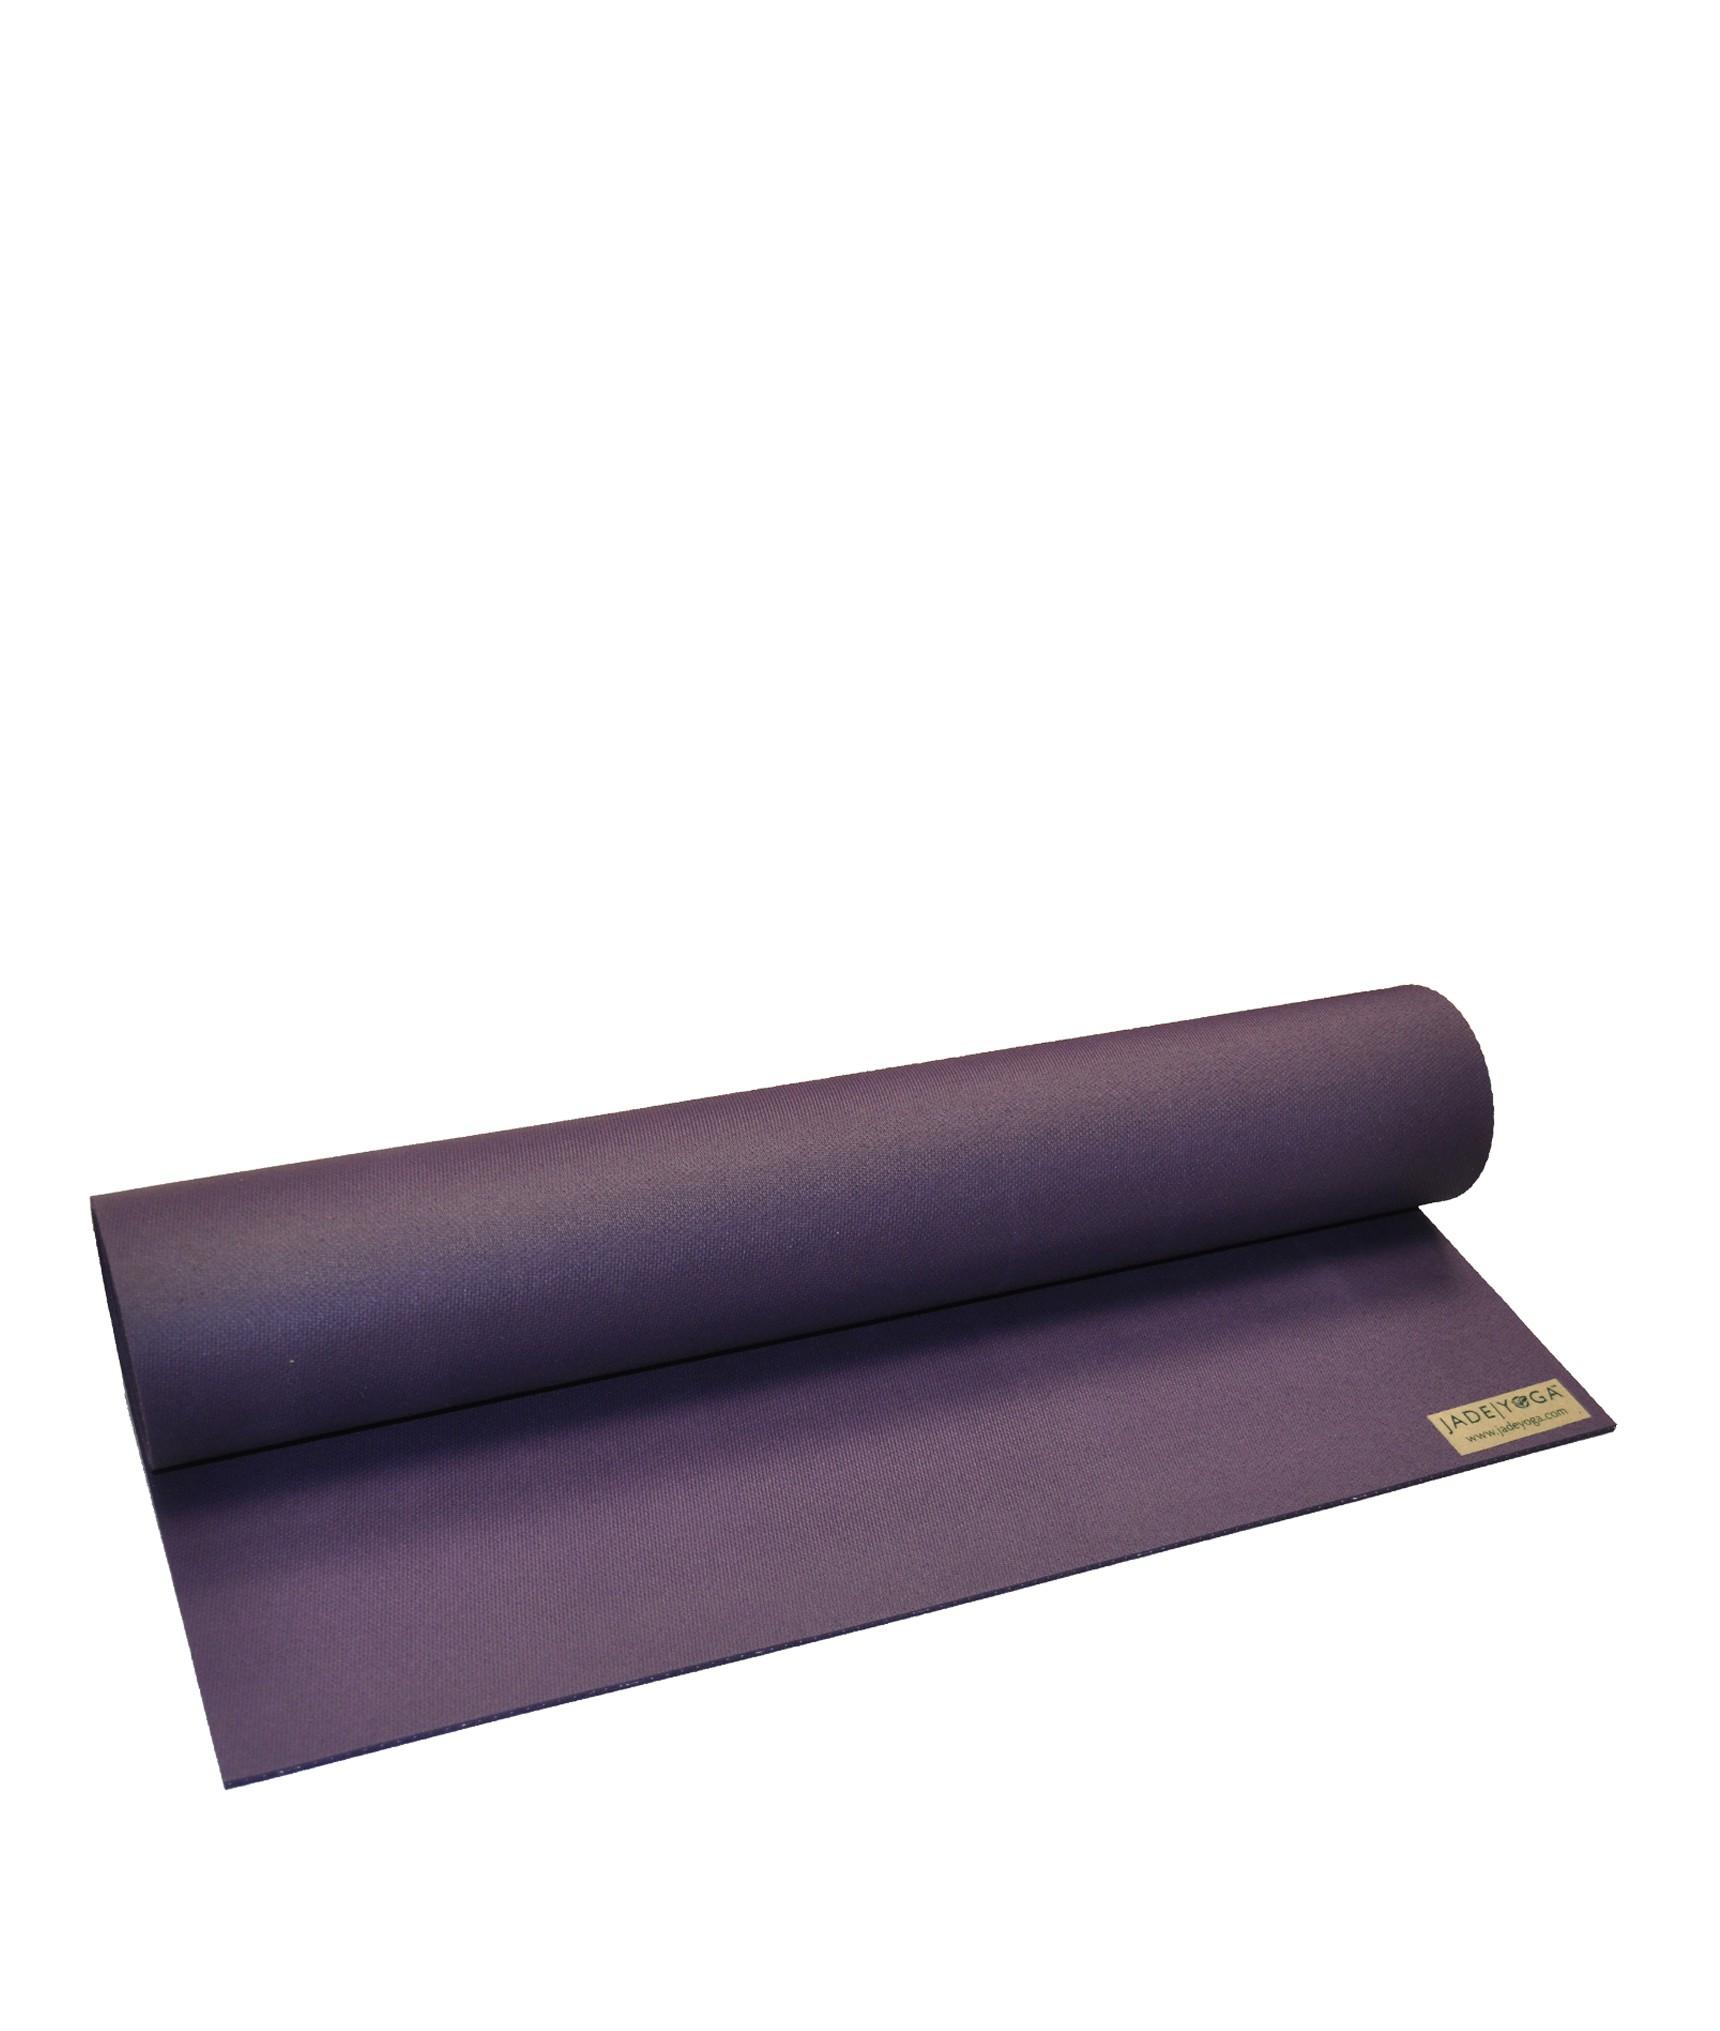 co mat jade harmony colours amazon professional x travel uk all yoga raspberry dp outdoors sports